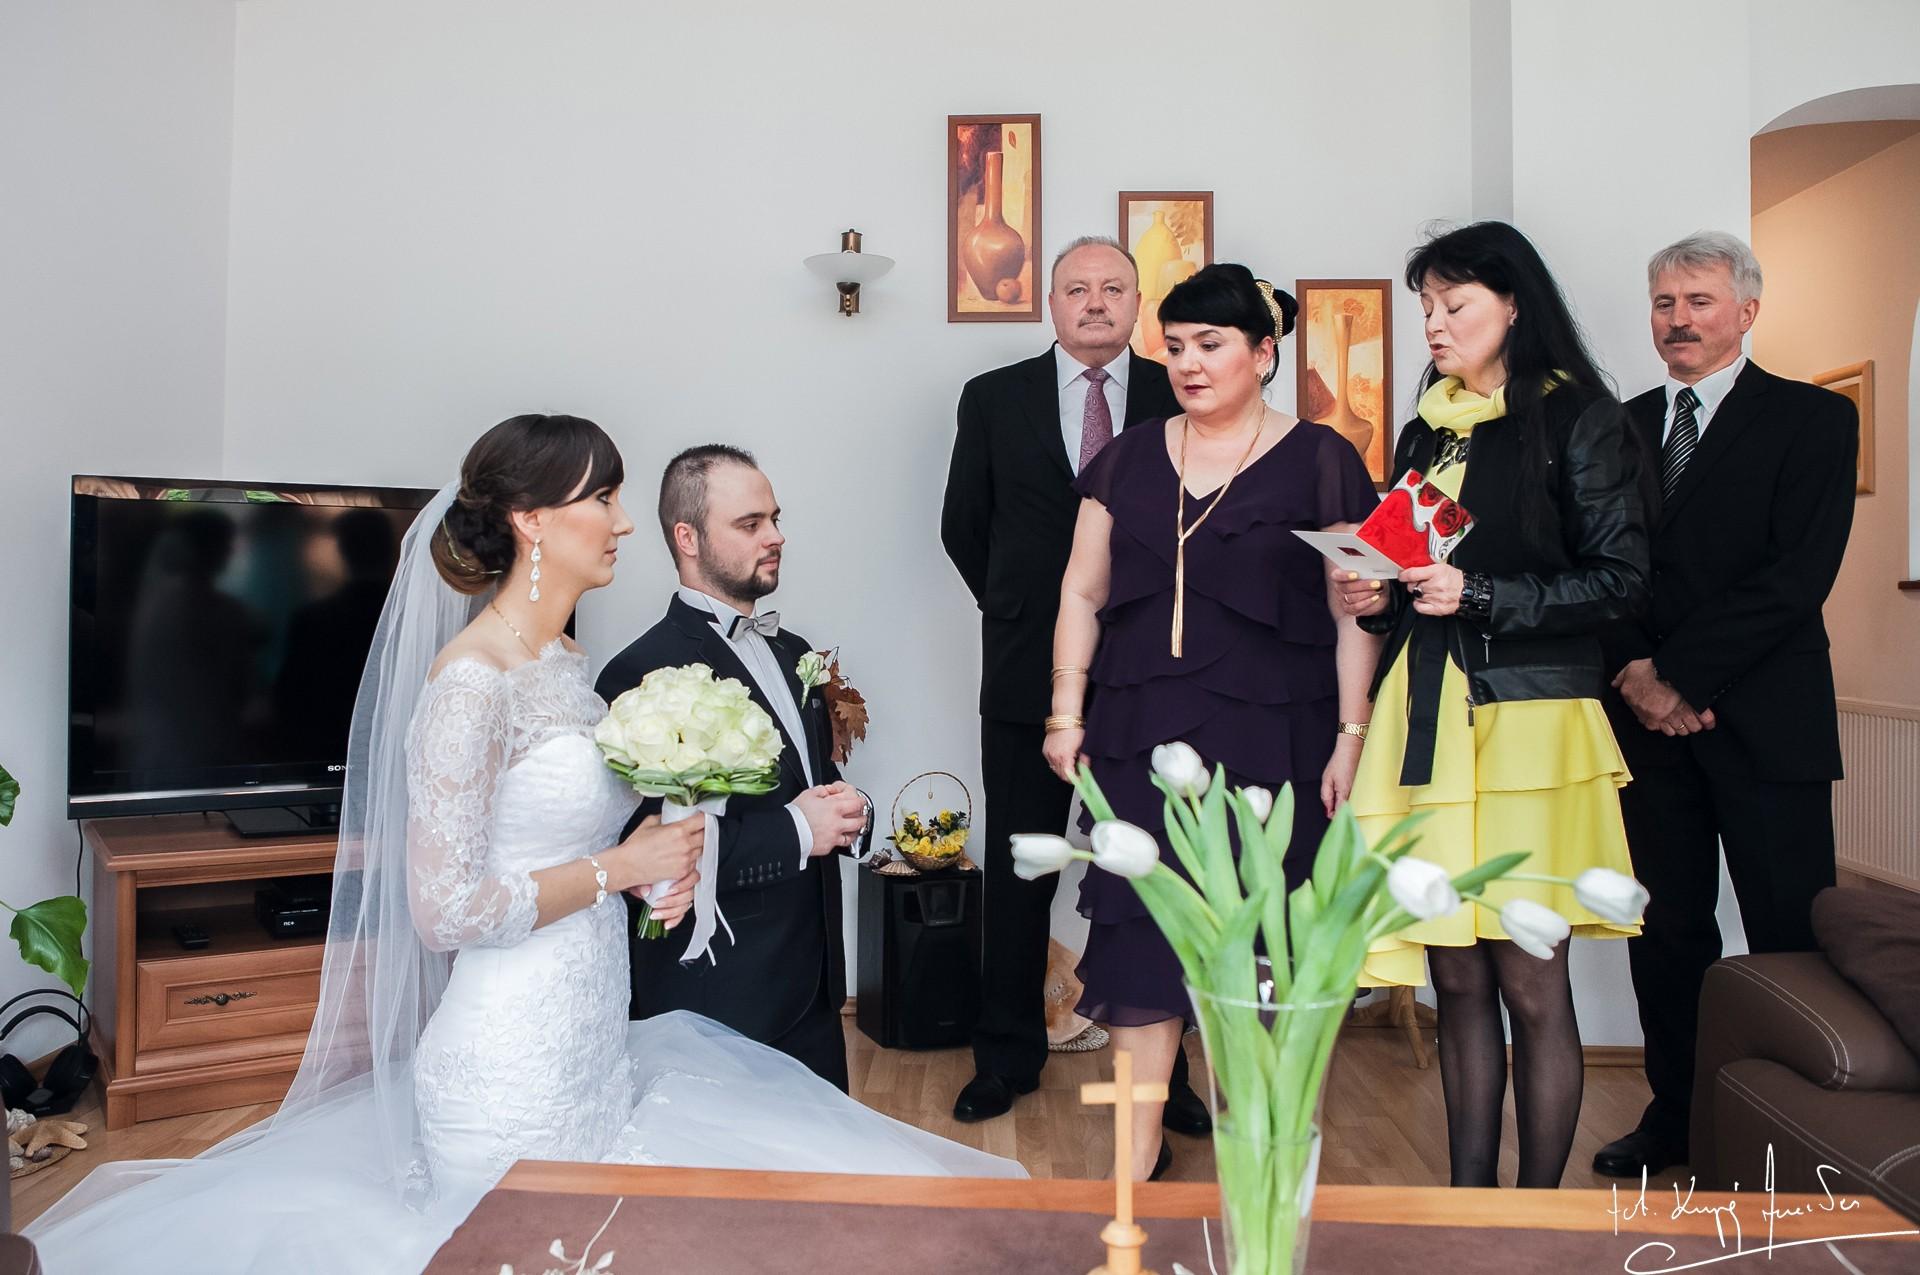 fotograf slubny szklarska poreba 24 Alicja & Tomasz